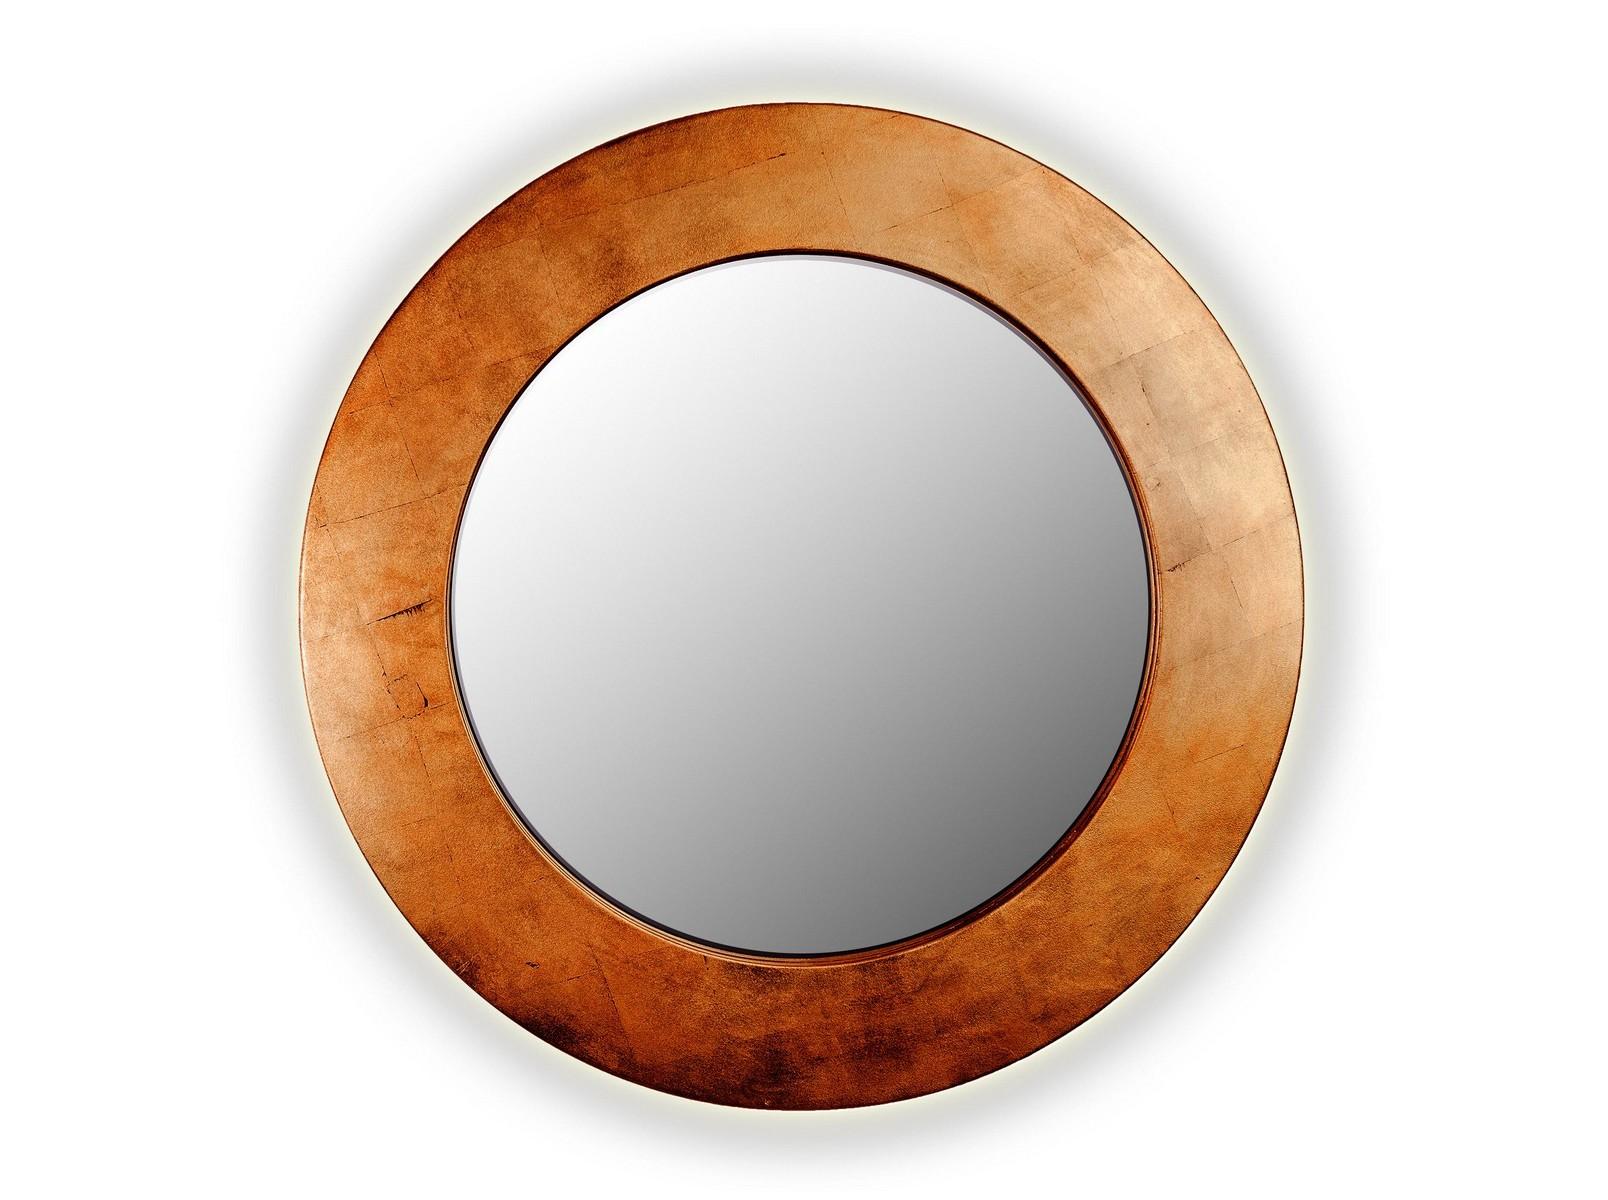 Зеркало PIECESНастенные зеркала<br><br><br>Material: Дерево<br>Глубина см: 3